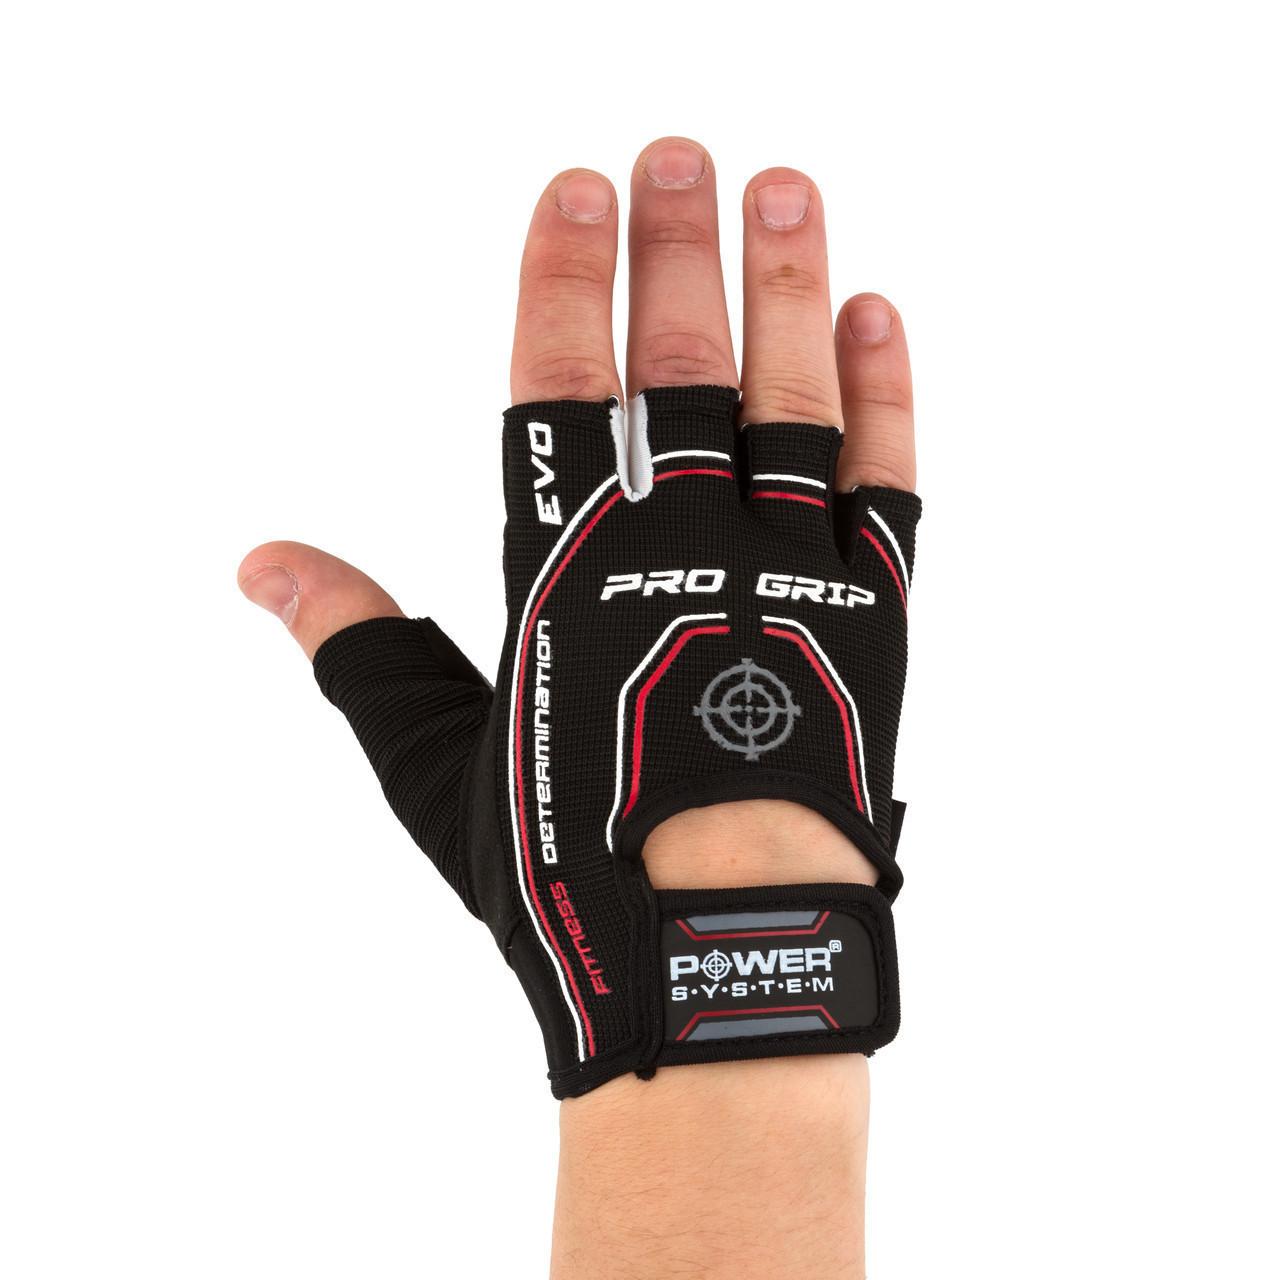 Перчатки для фитнеса и тяжелой атлетики Power System Pro Grip EVO PS-2250E XL Black